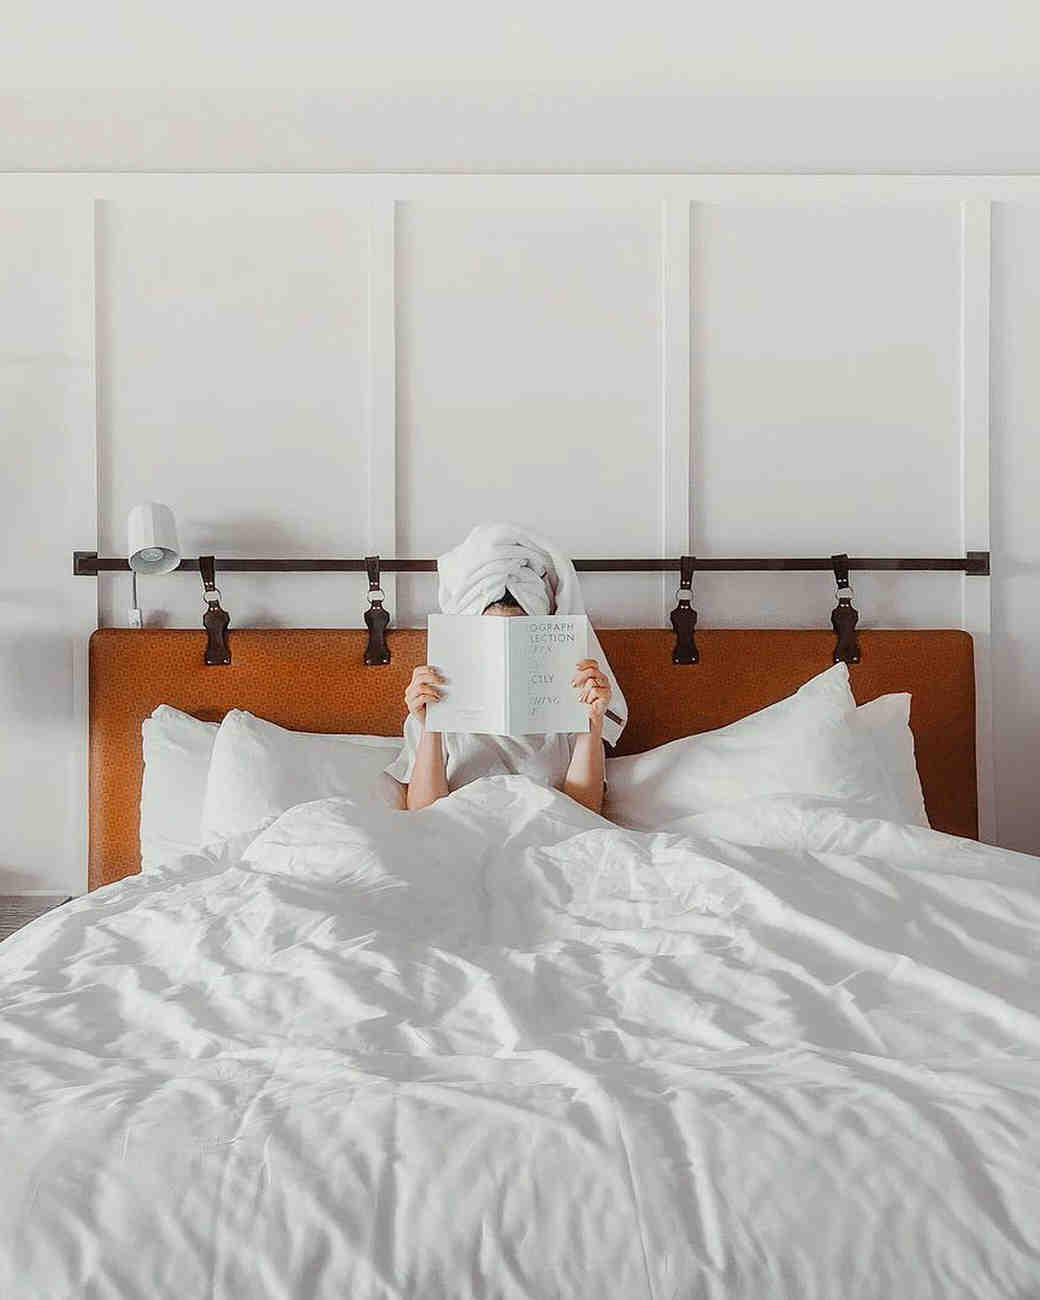 los angeles bachelorette party hotel westdrift